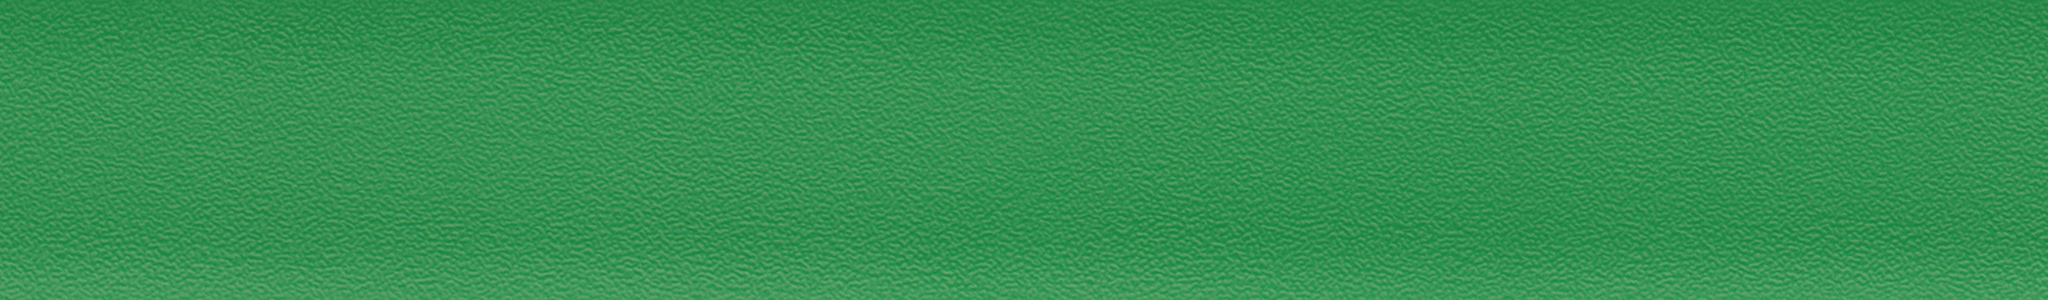 HU 16029 ABS hrana zelená perla 101